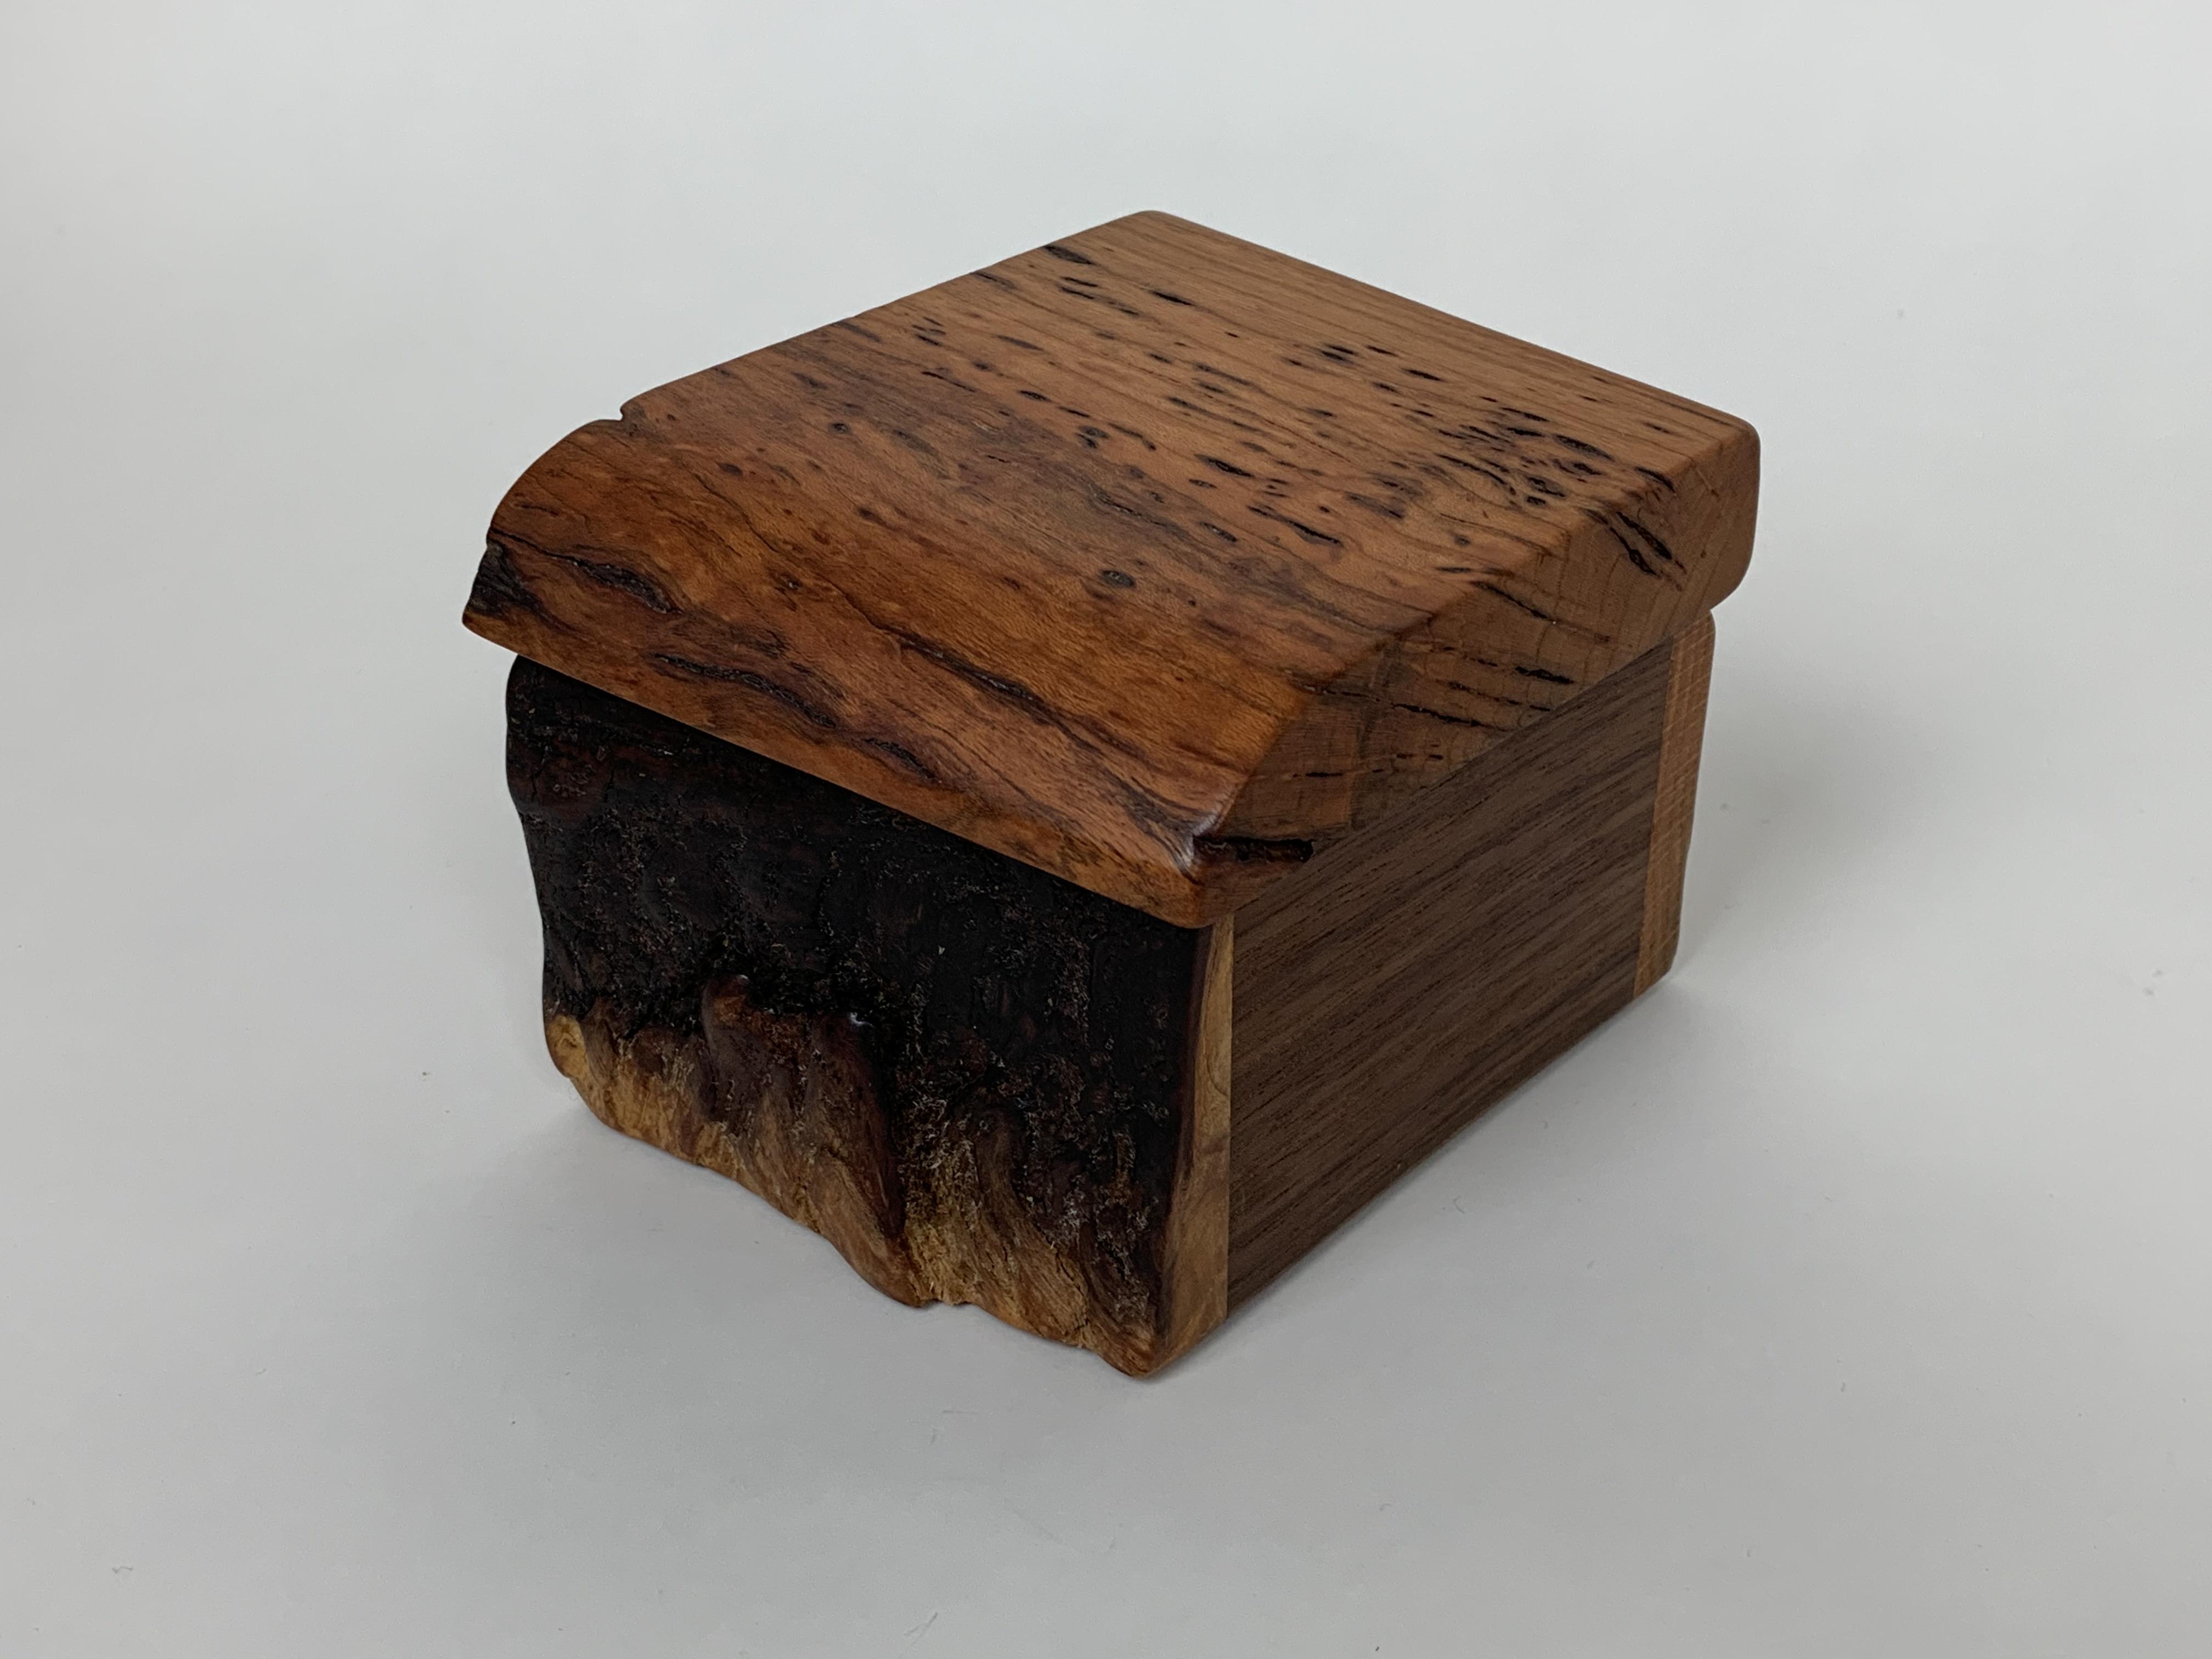 Box w/ Bark 3